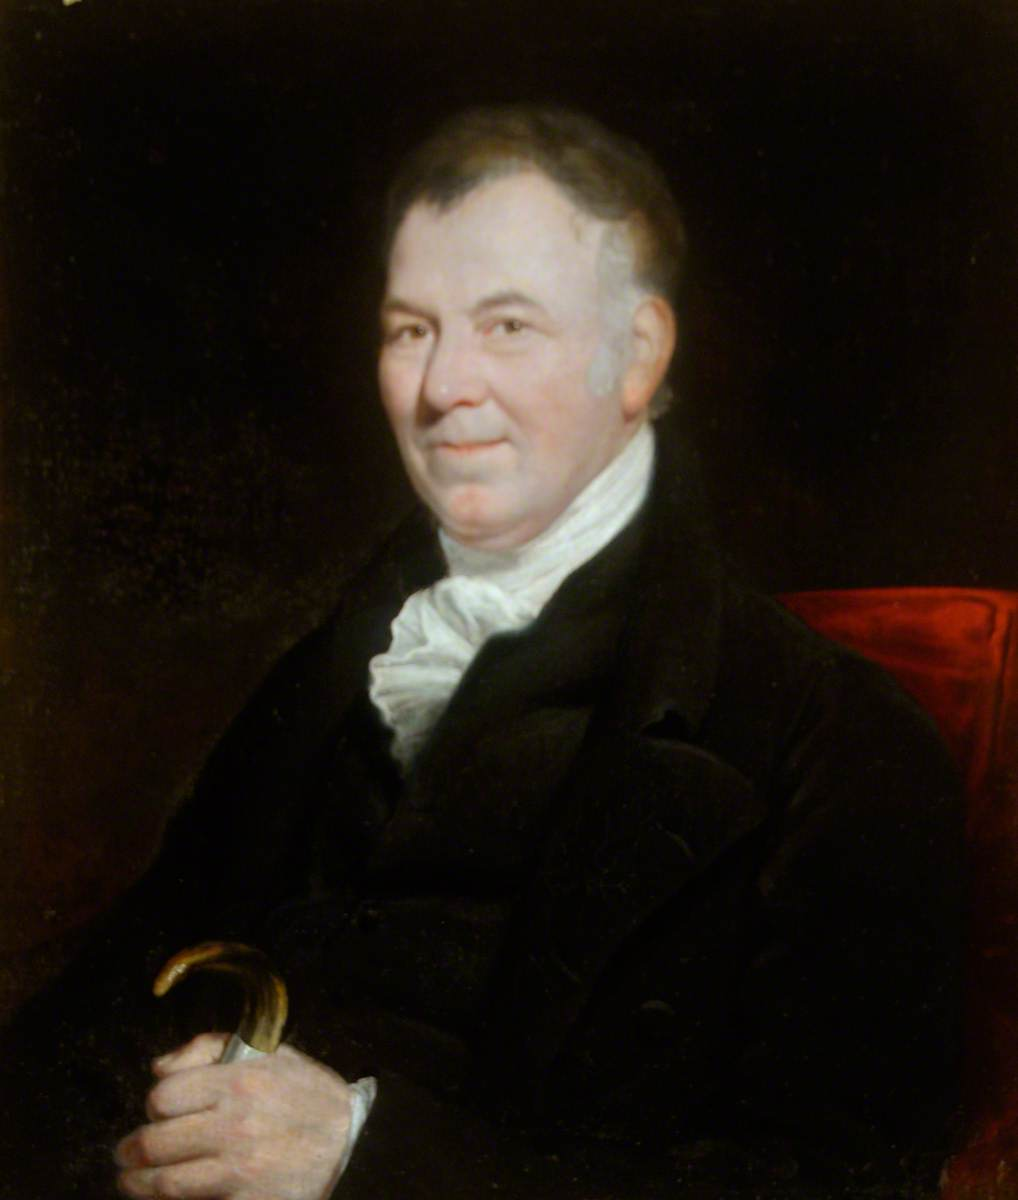 Thomas Bewick (1753–1828), Wood Engraver and Ornithologist